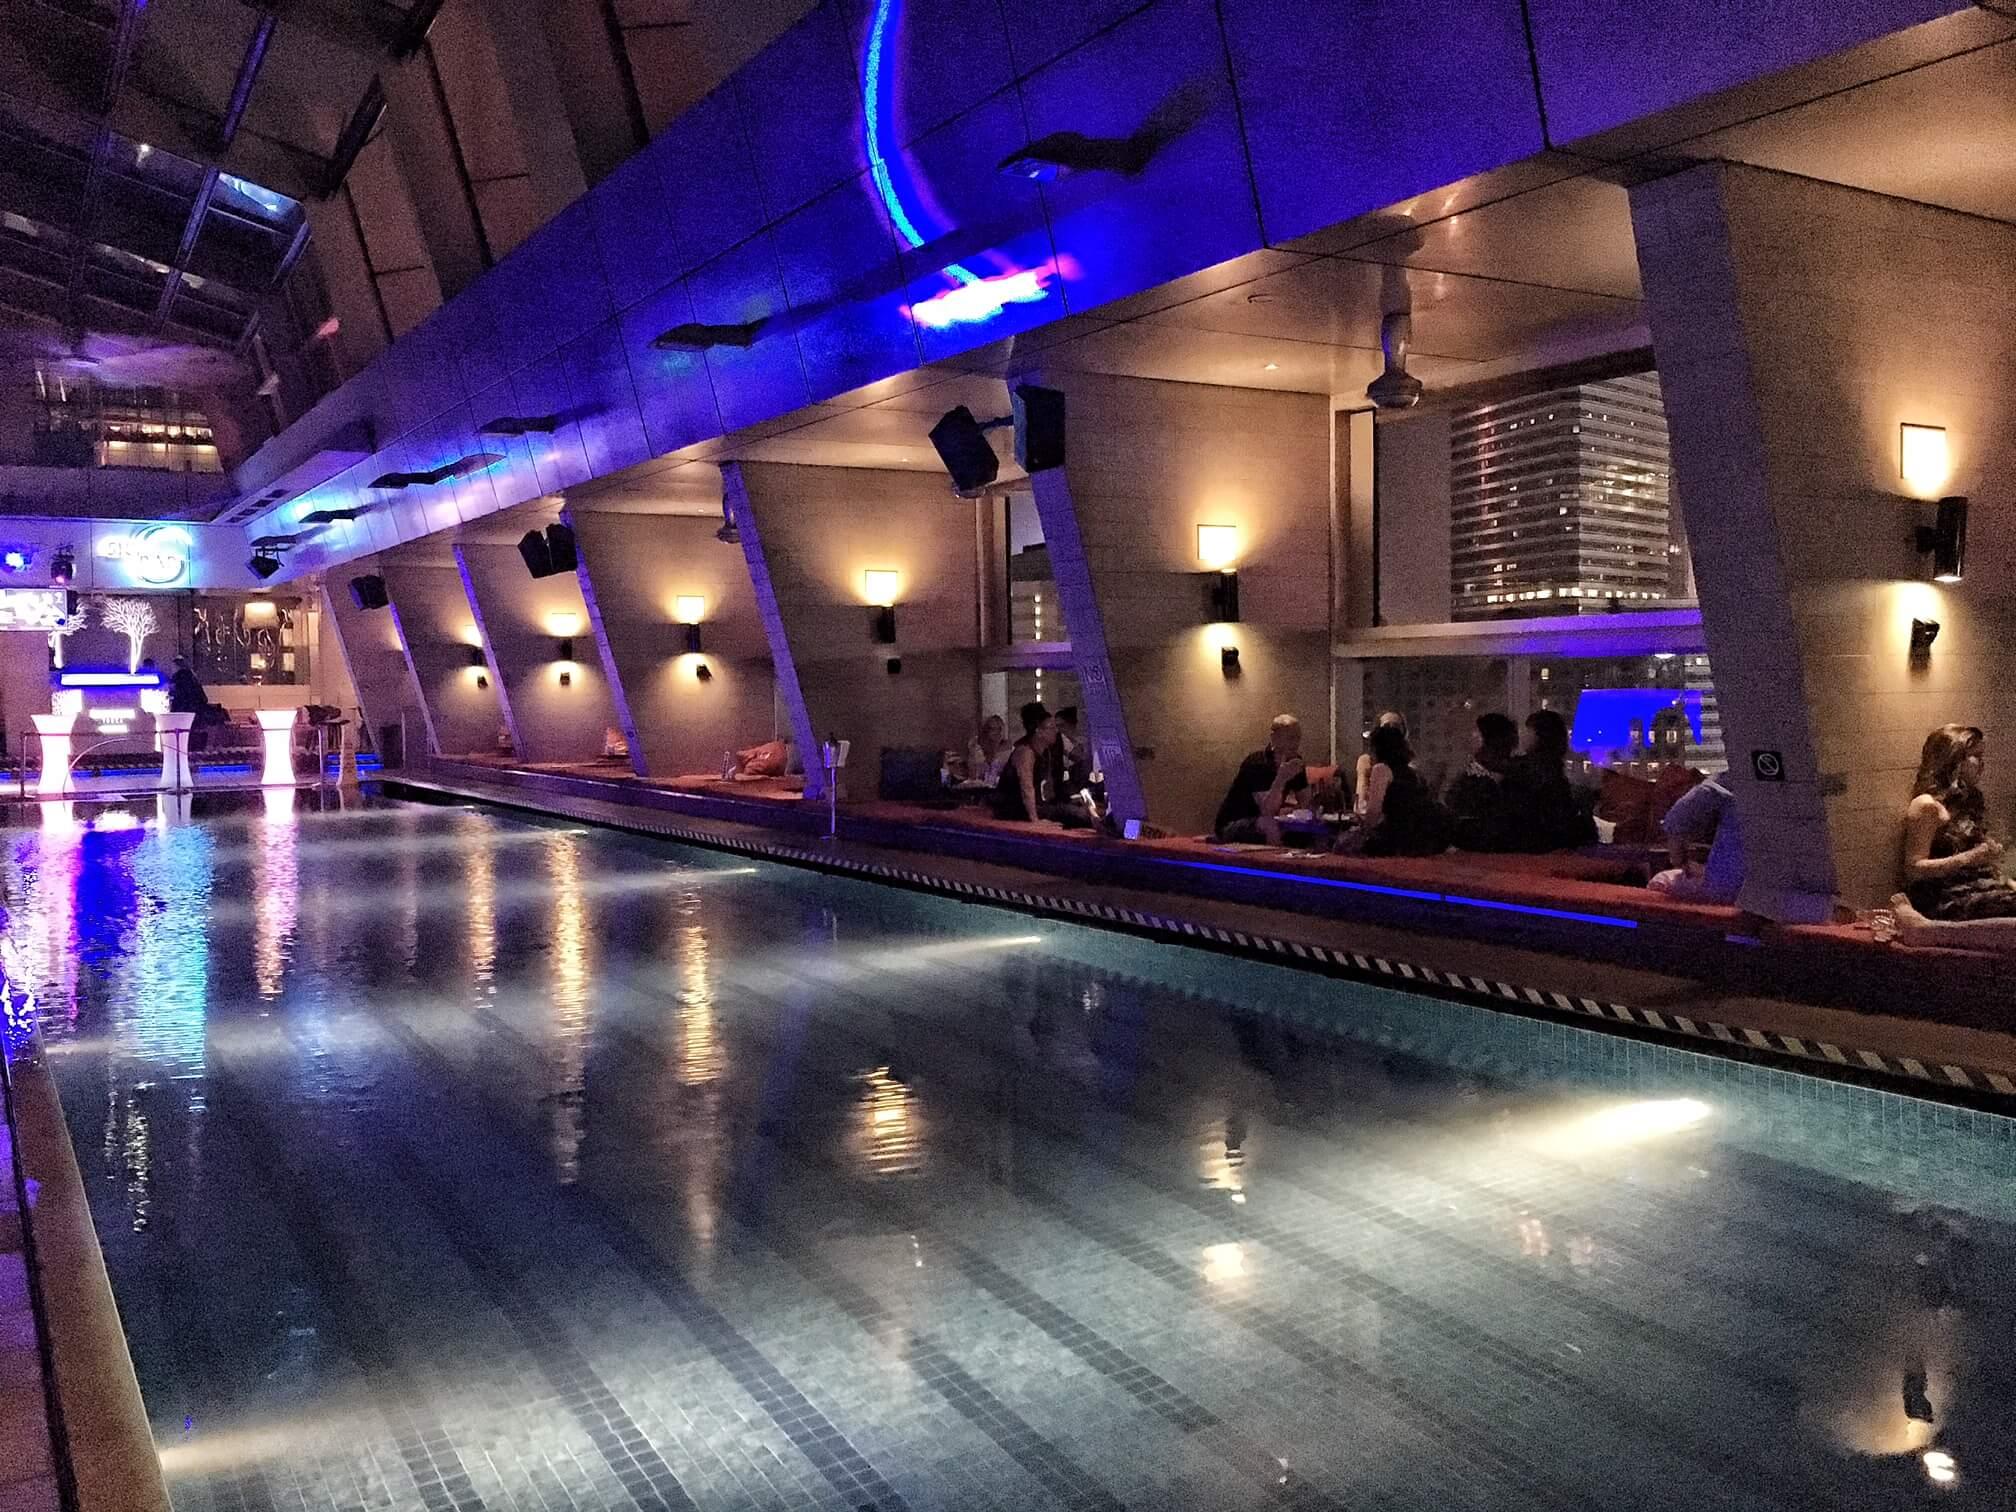 The swimming pool inside Sky Bar, Kuala Lumpur